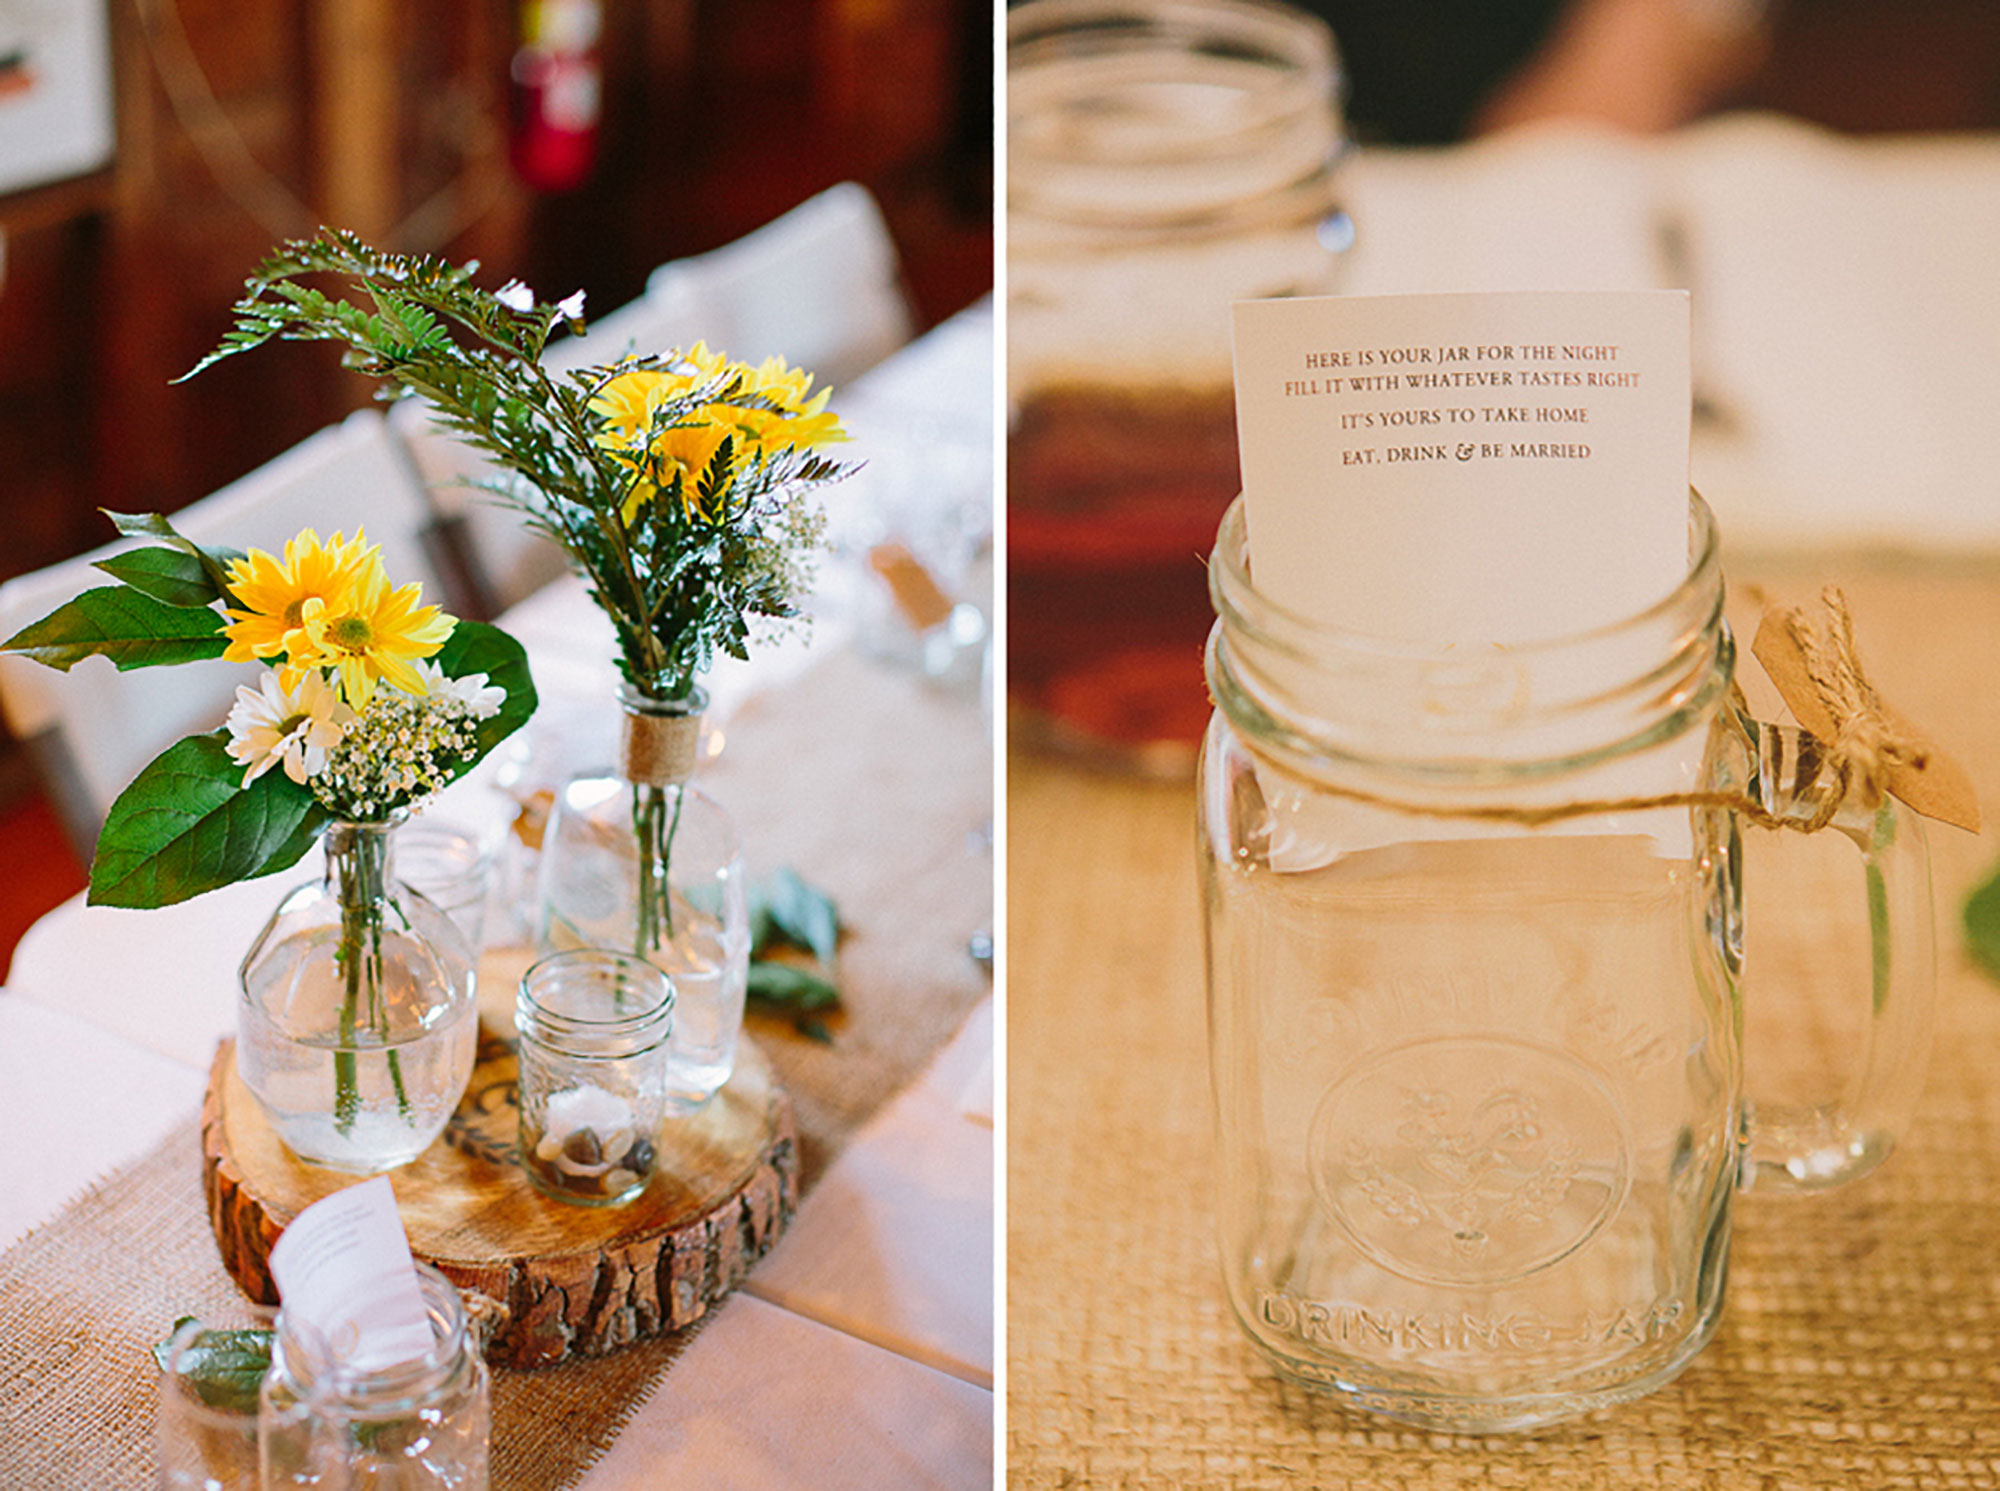 Navy-Hall-Wedding-Vineyard-Bride-Photo-By-Andrew-Mark-Photography-033.jpg